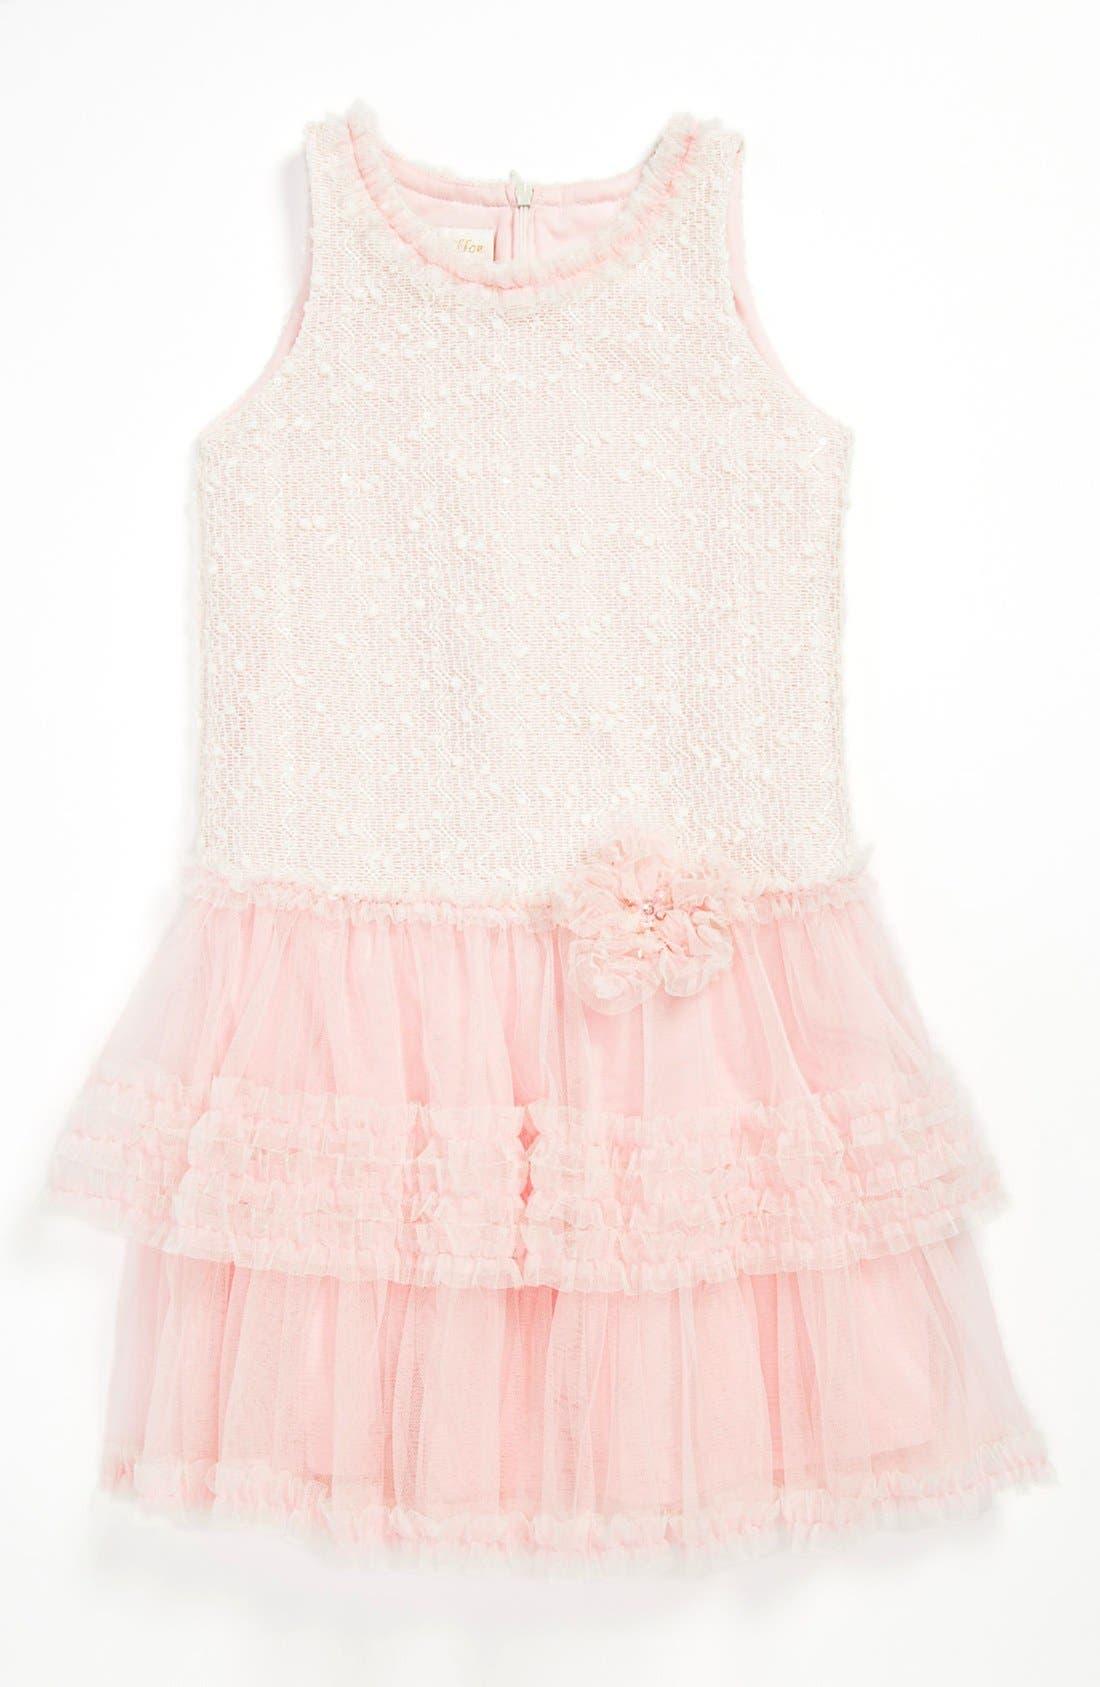 Main Image - Isobella & Chloe Drop Waist Dress (Little Girls)